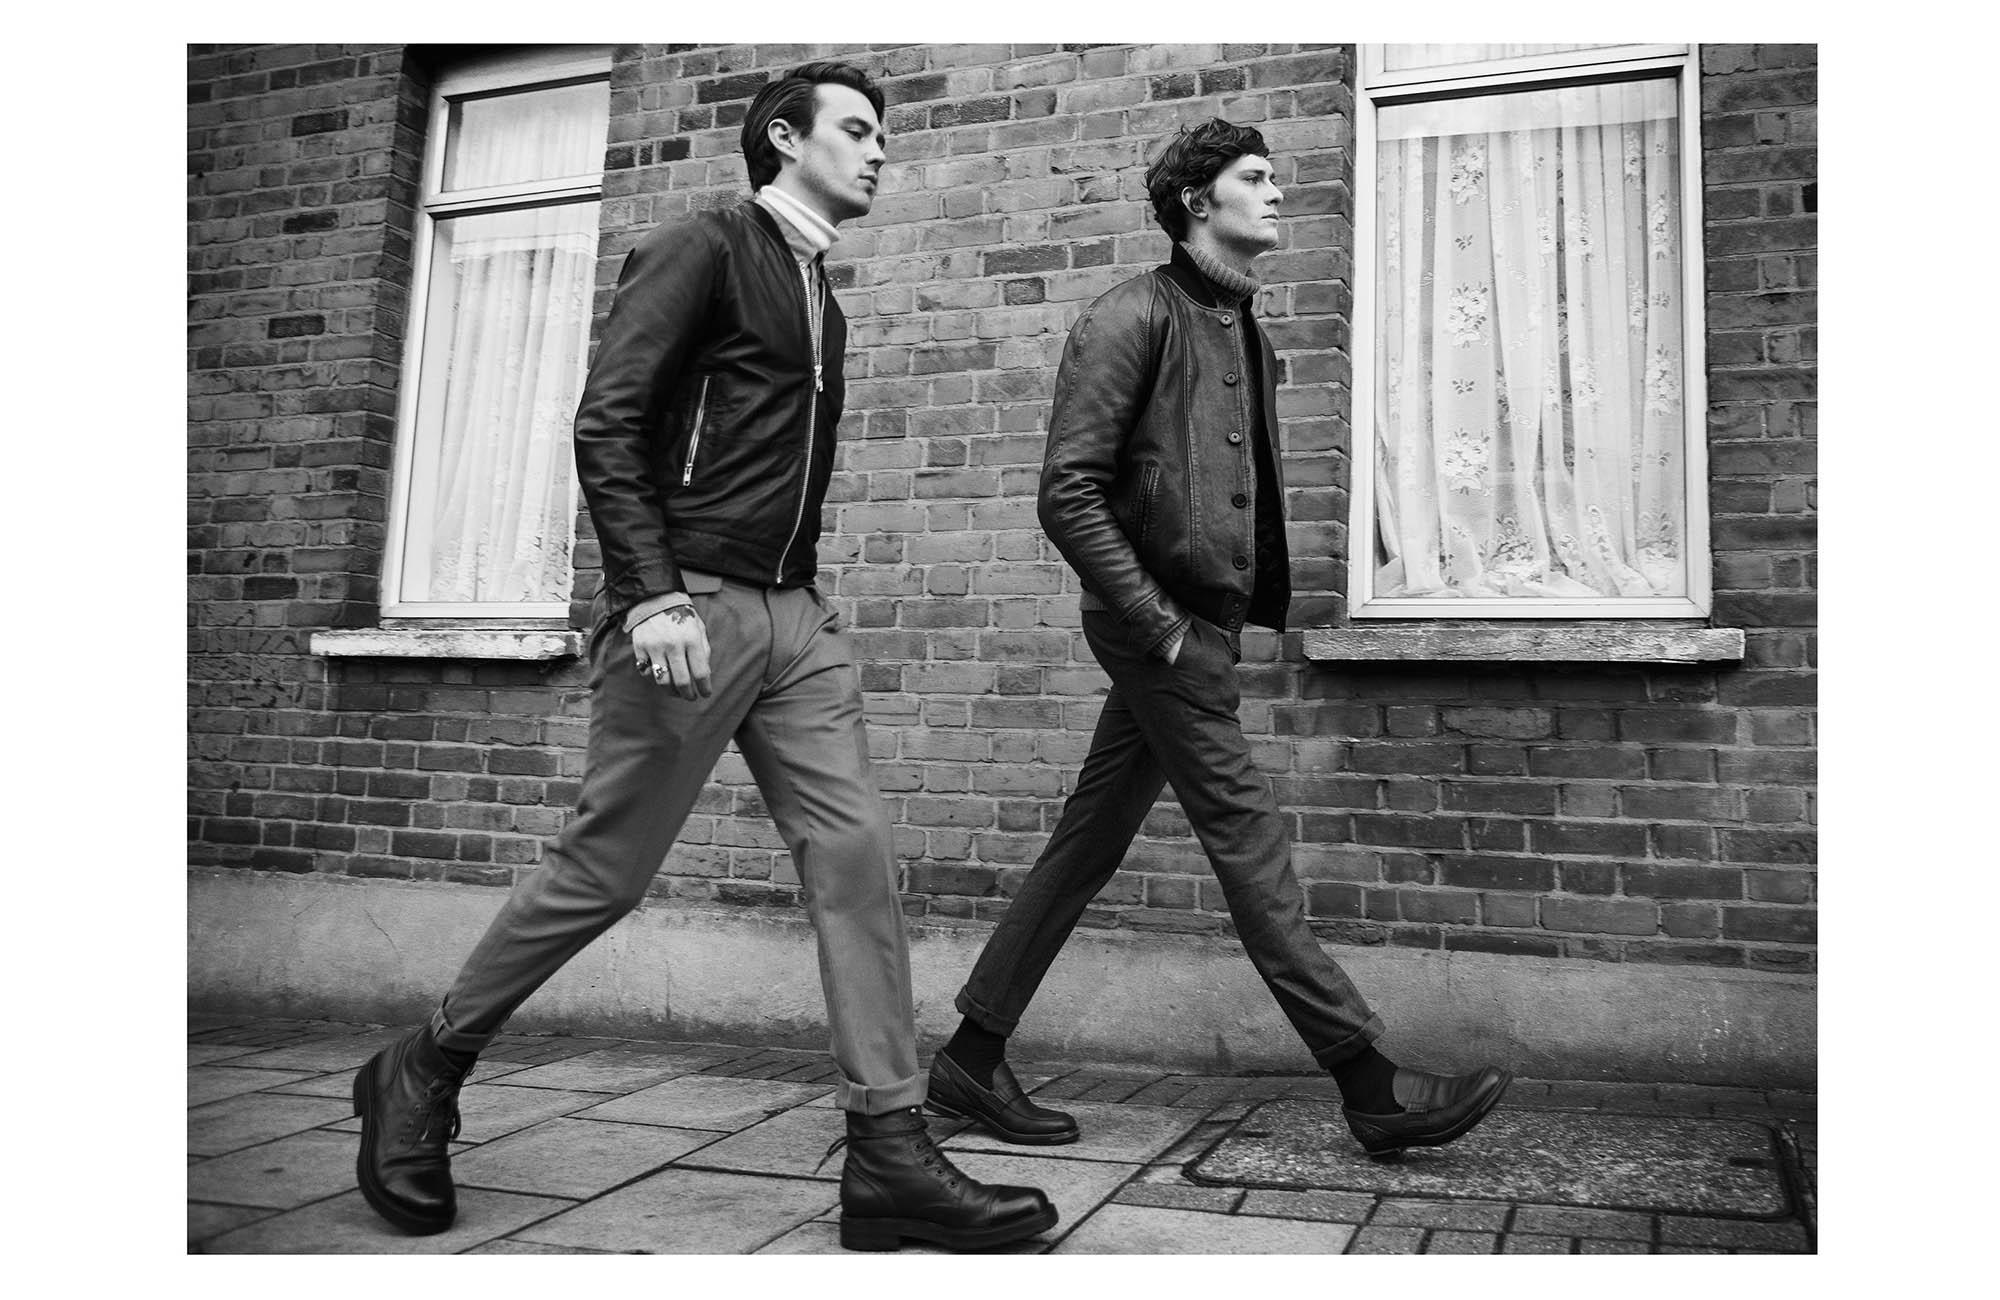 Jocks & Nerds Clapton Park - 4 of 5